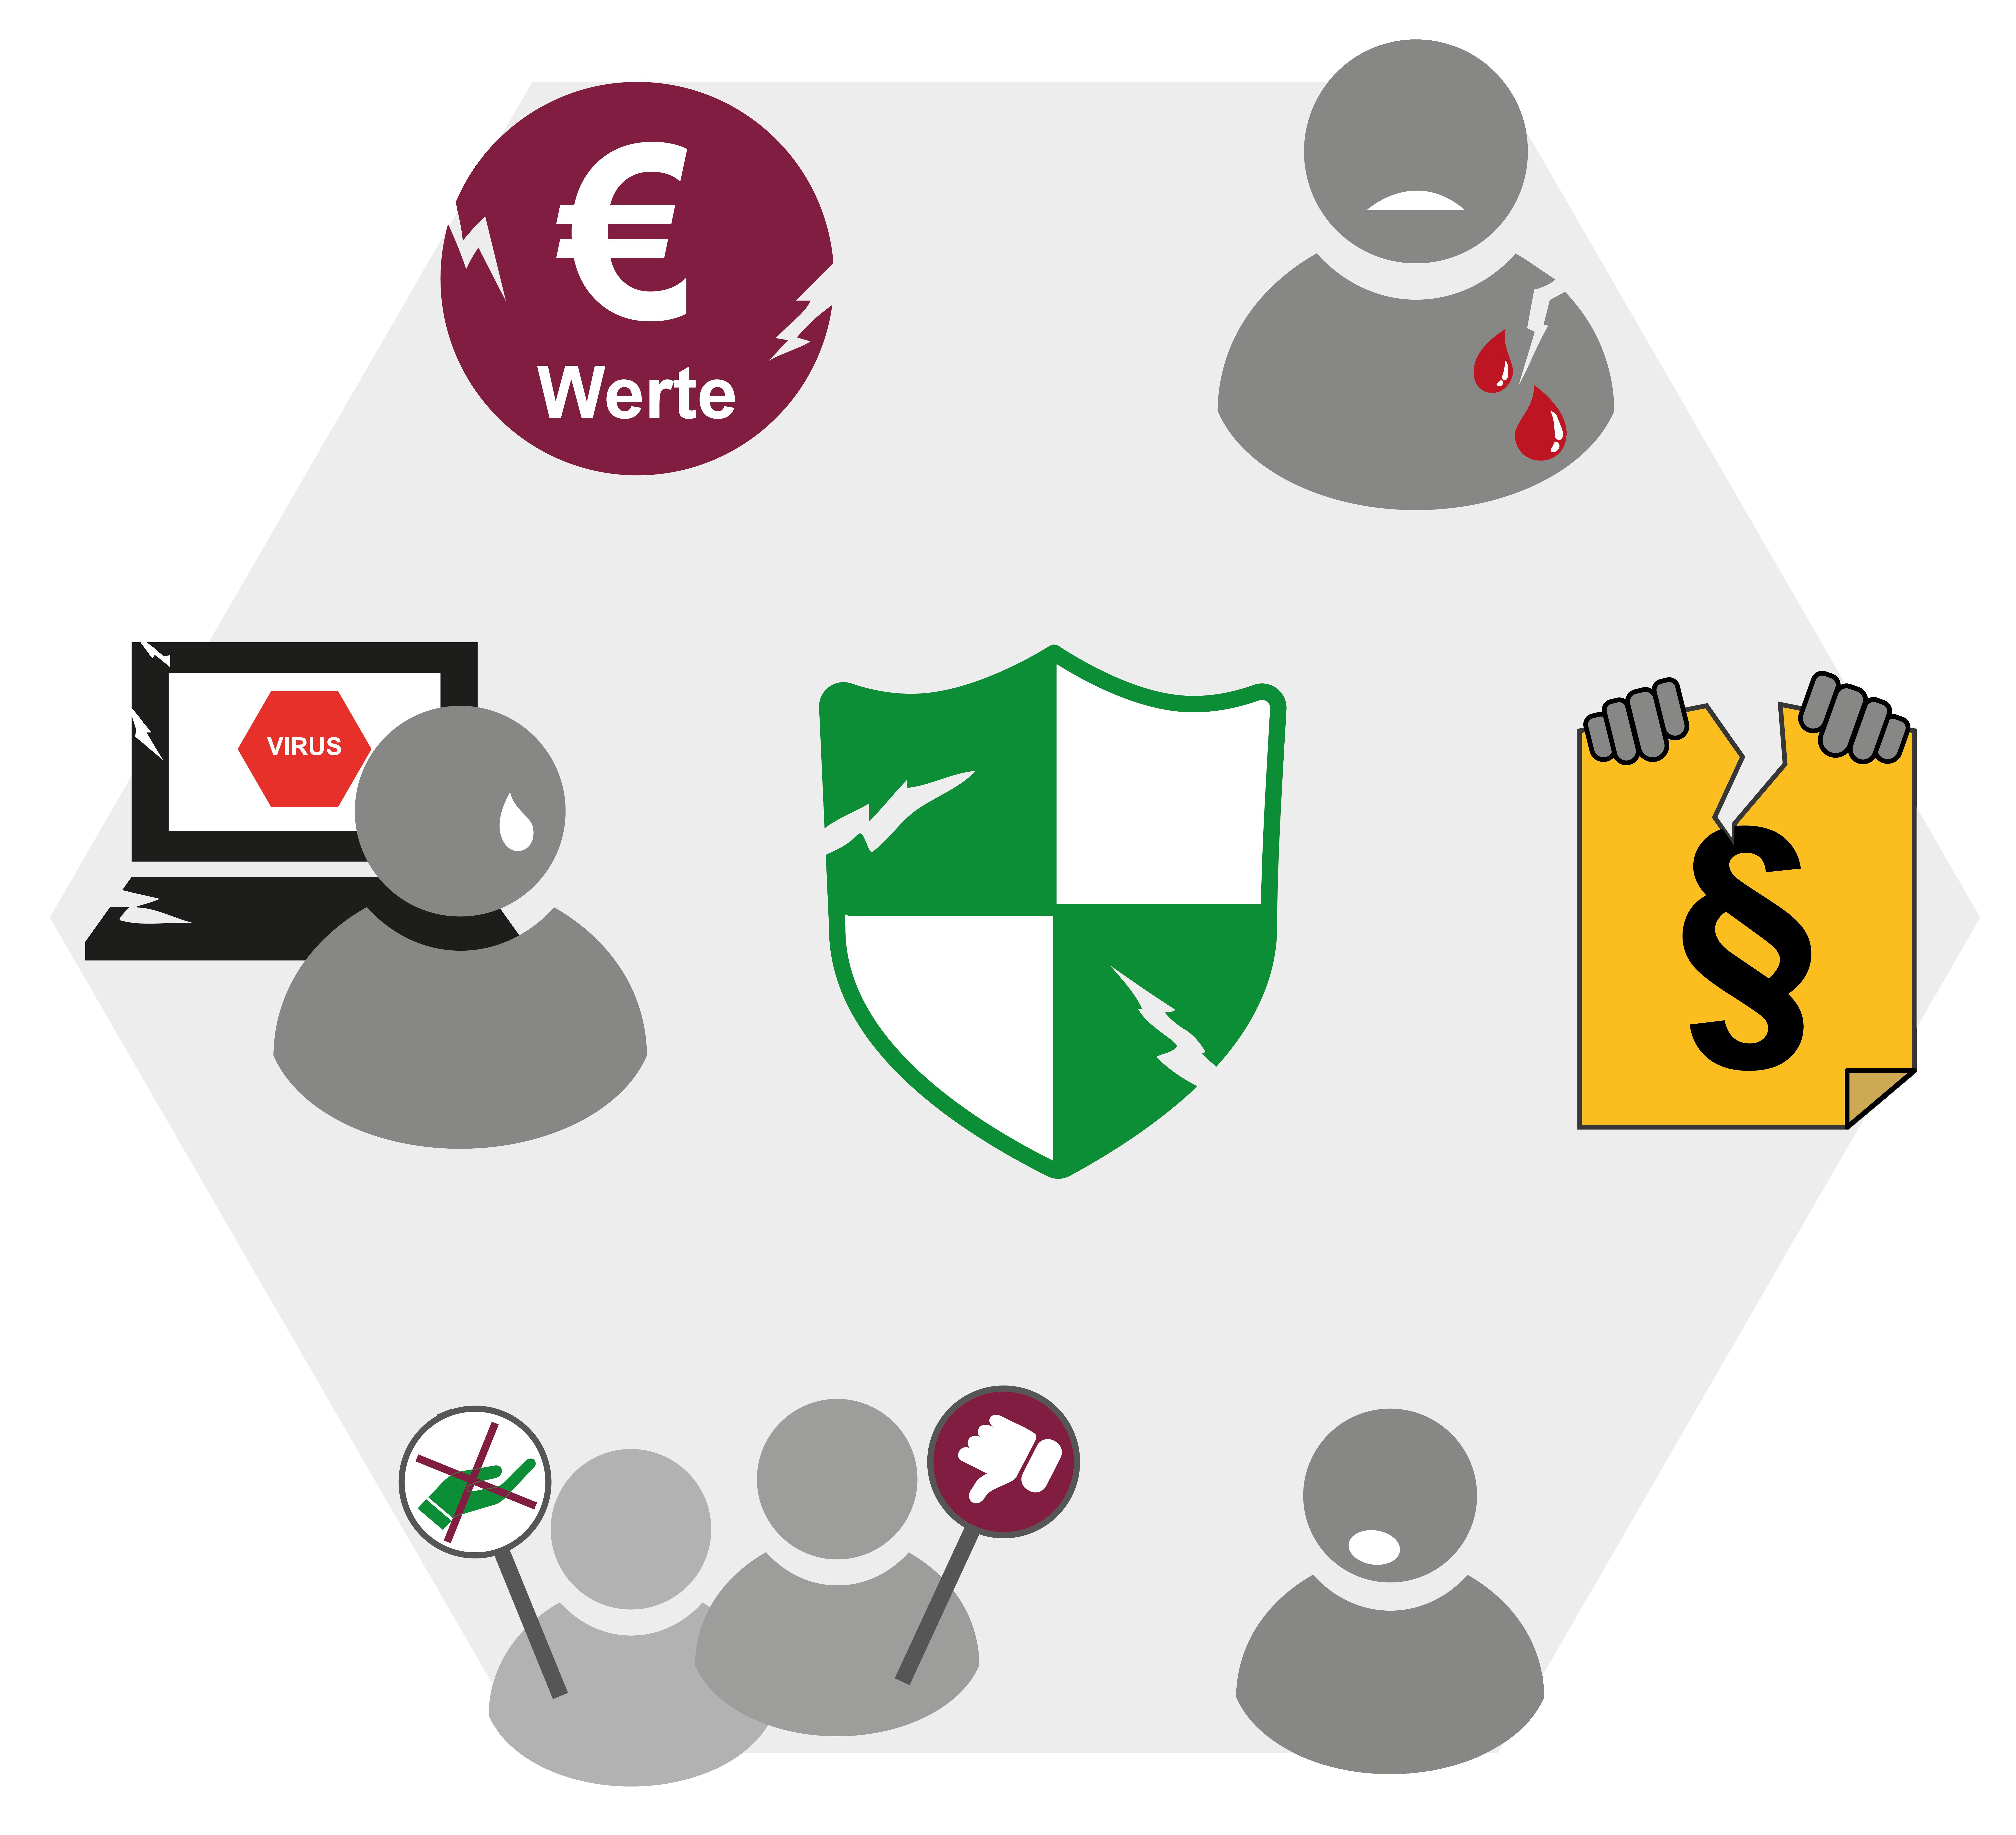 Cyber-Sicherheitsschaden – Glossar Cyber-Sicherheit – Prof. Norbert Pohlmann